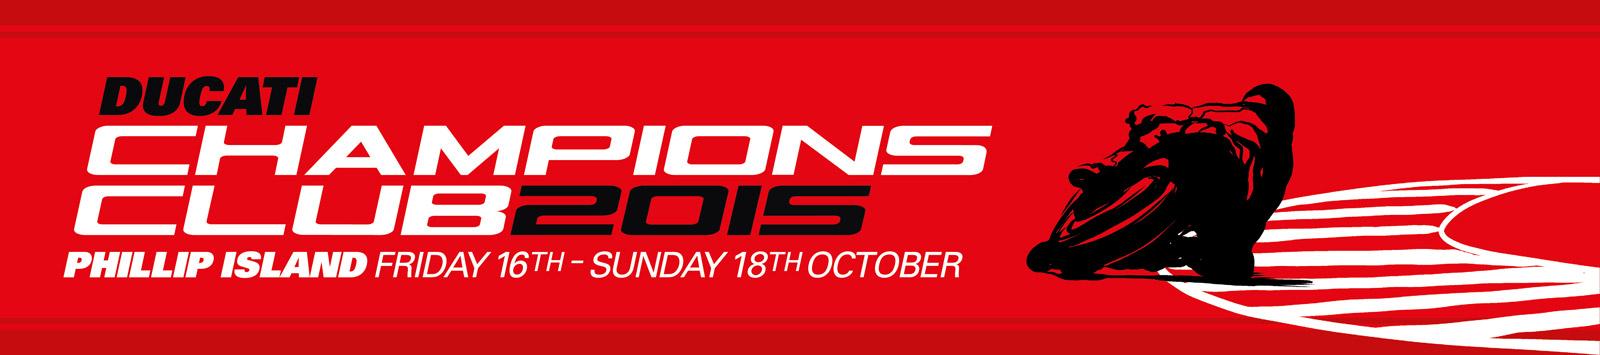 Ducati_Champions-Club-2015_Registernow